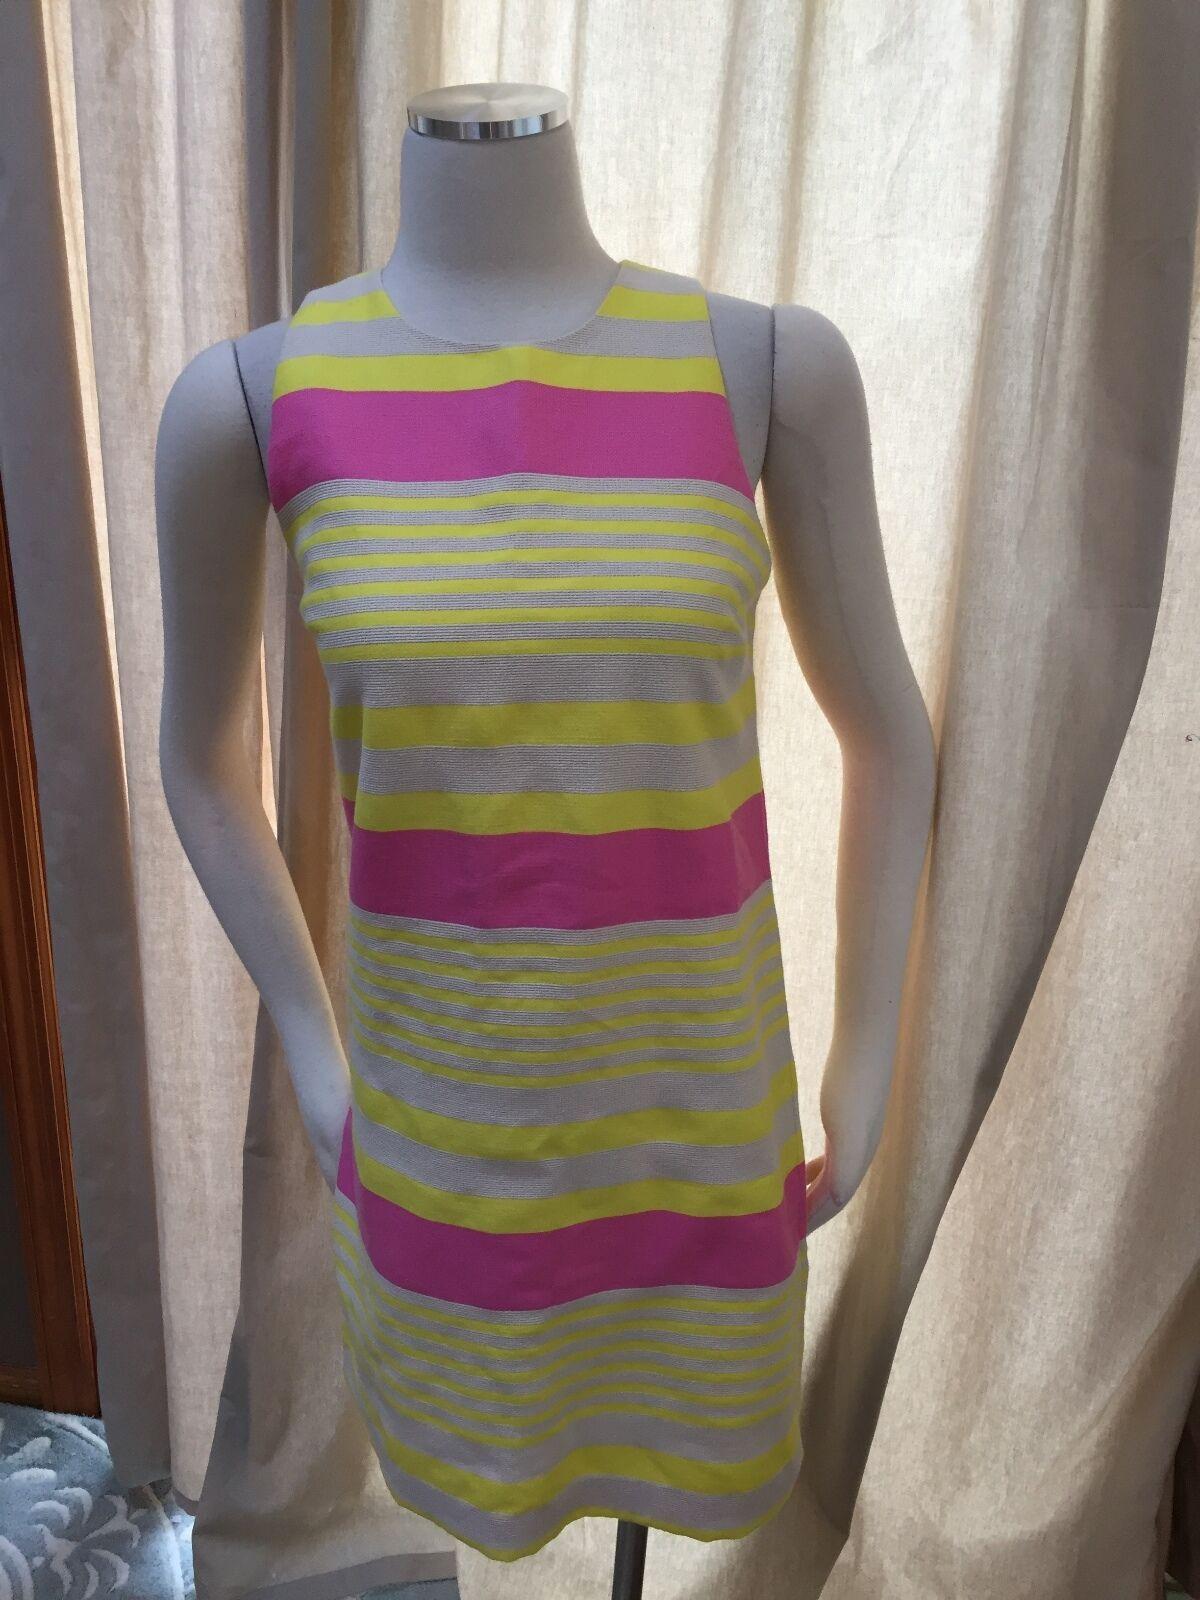 Ann Taylor Loft Pink Yellow Ivory Textured Stripe Shift Dress 0 Excellent